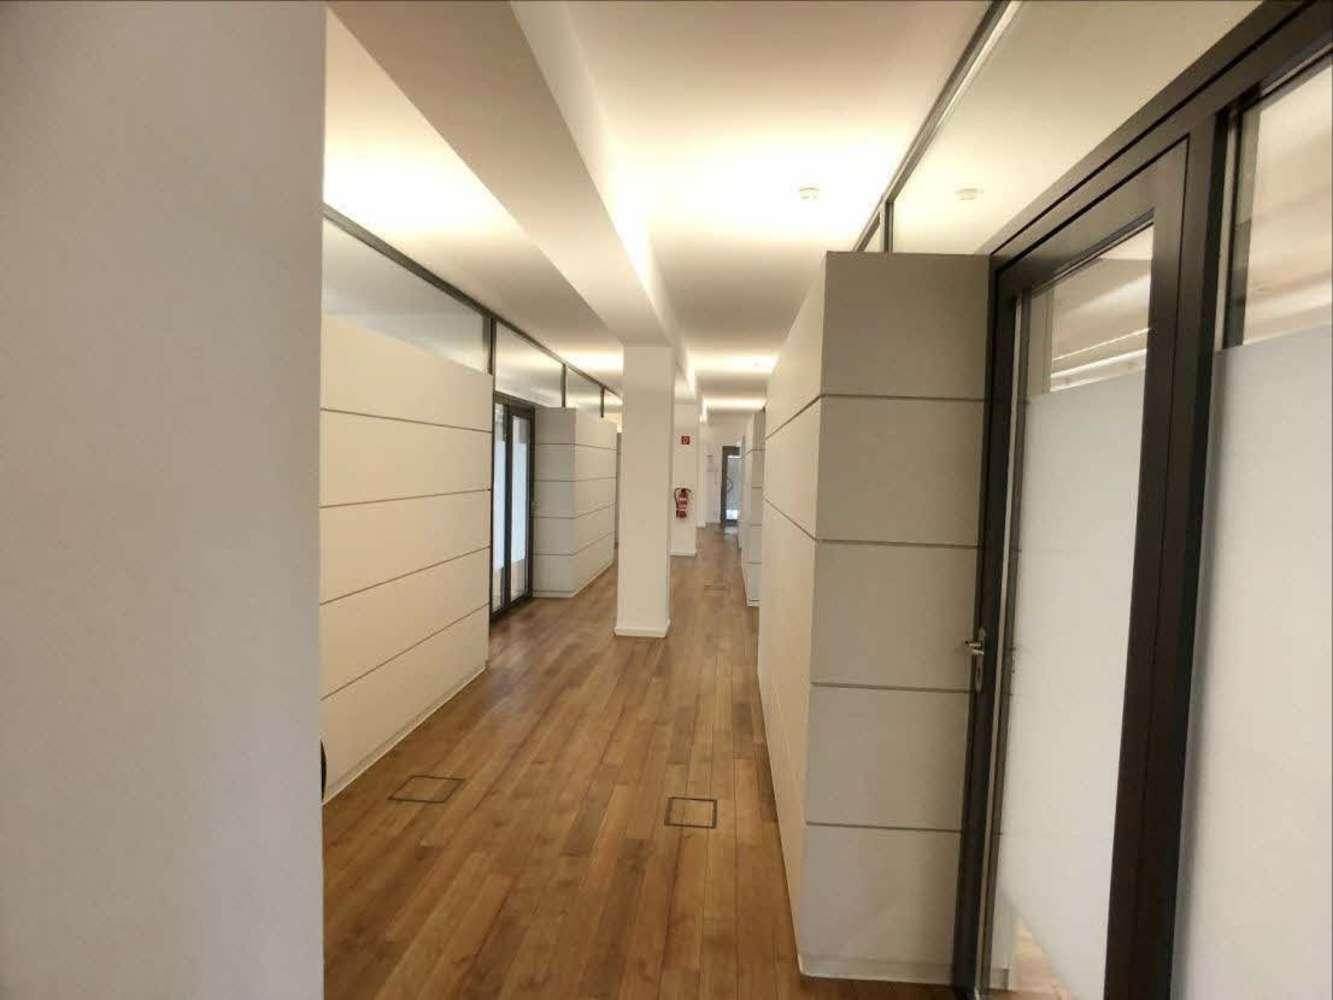 Büros Frankfurt am main, 60314 - Büro - Frankfurt am Main, Ostend - F1260 - 9537420